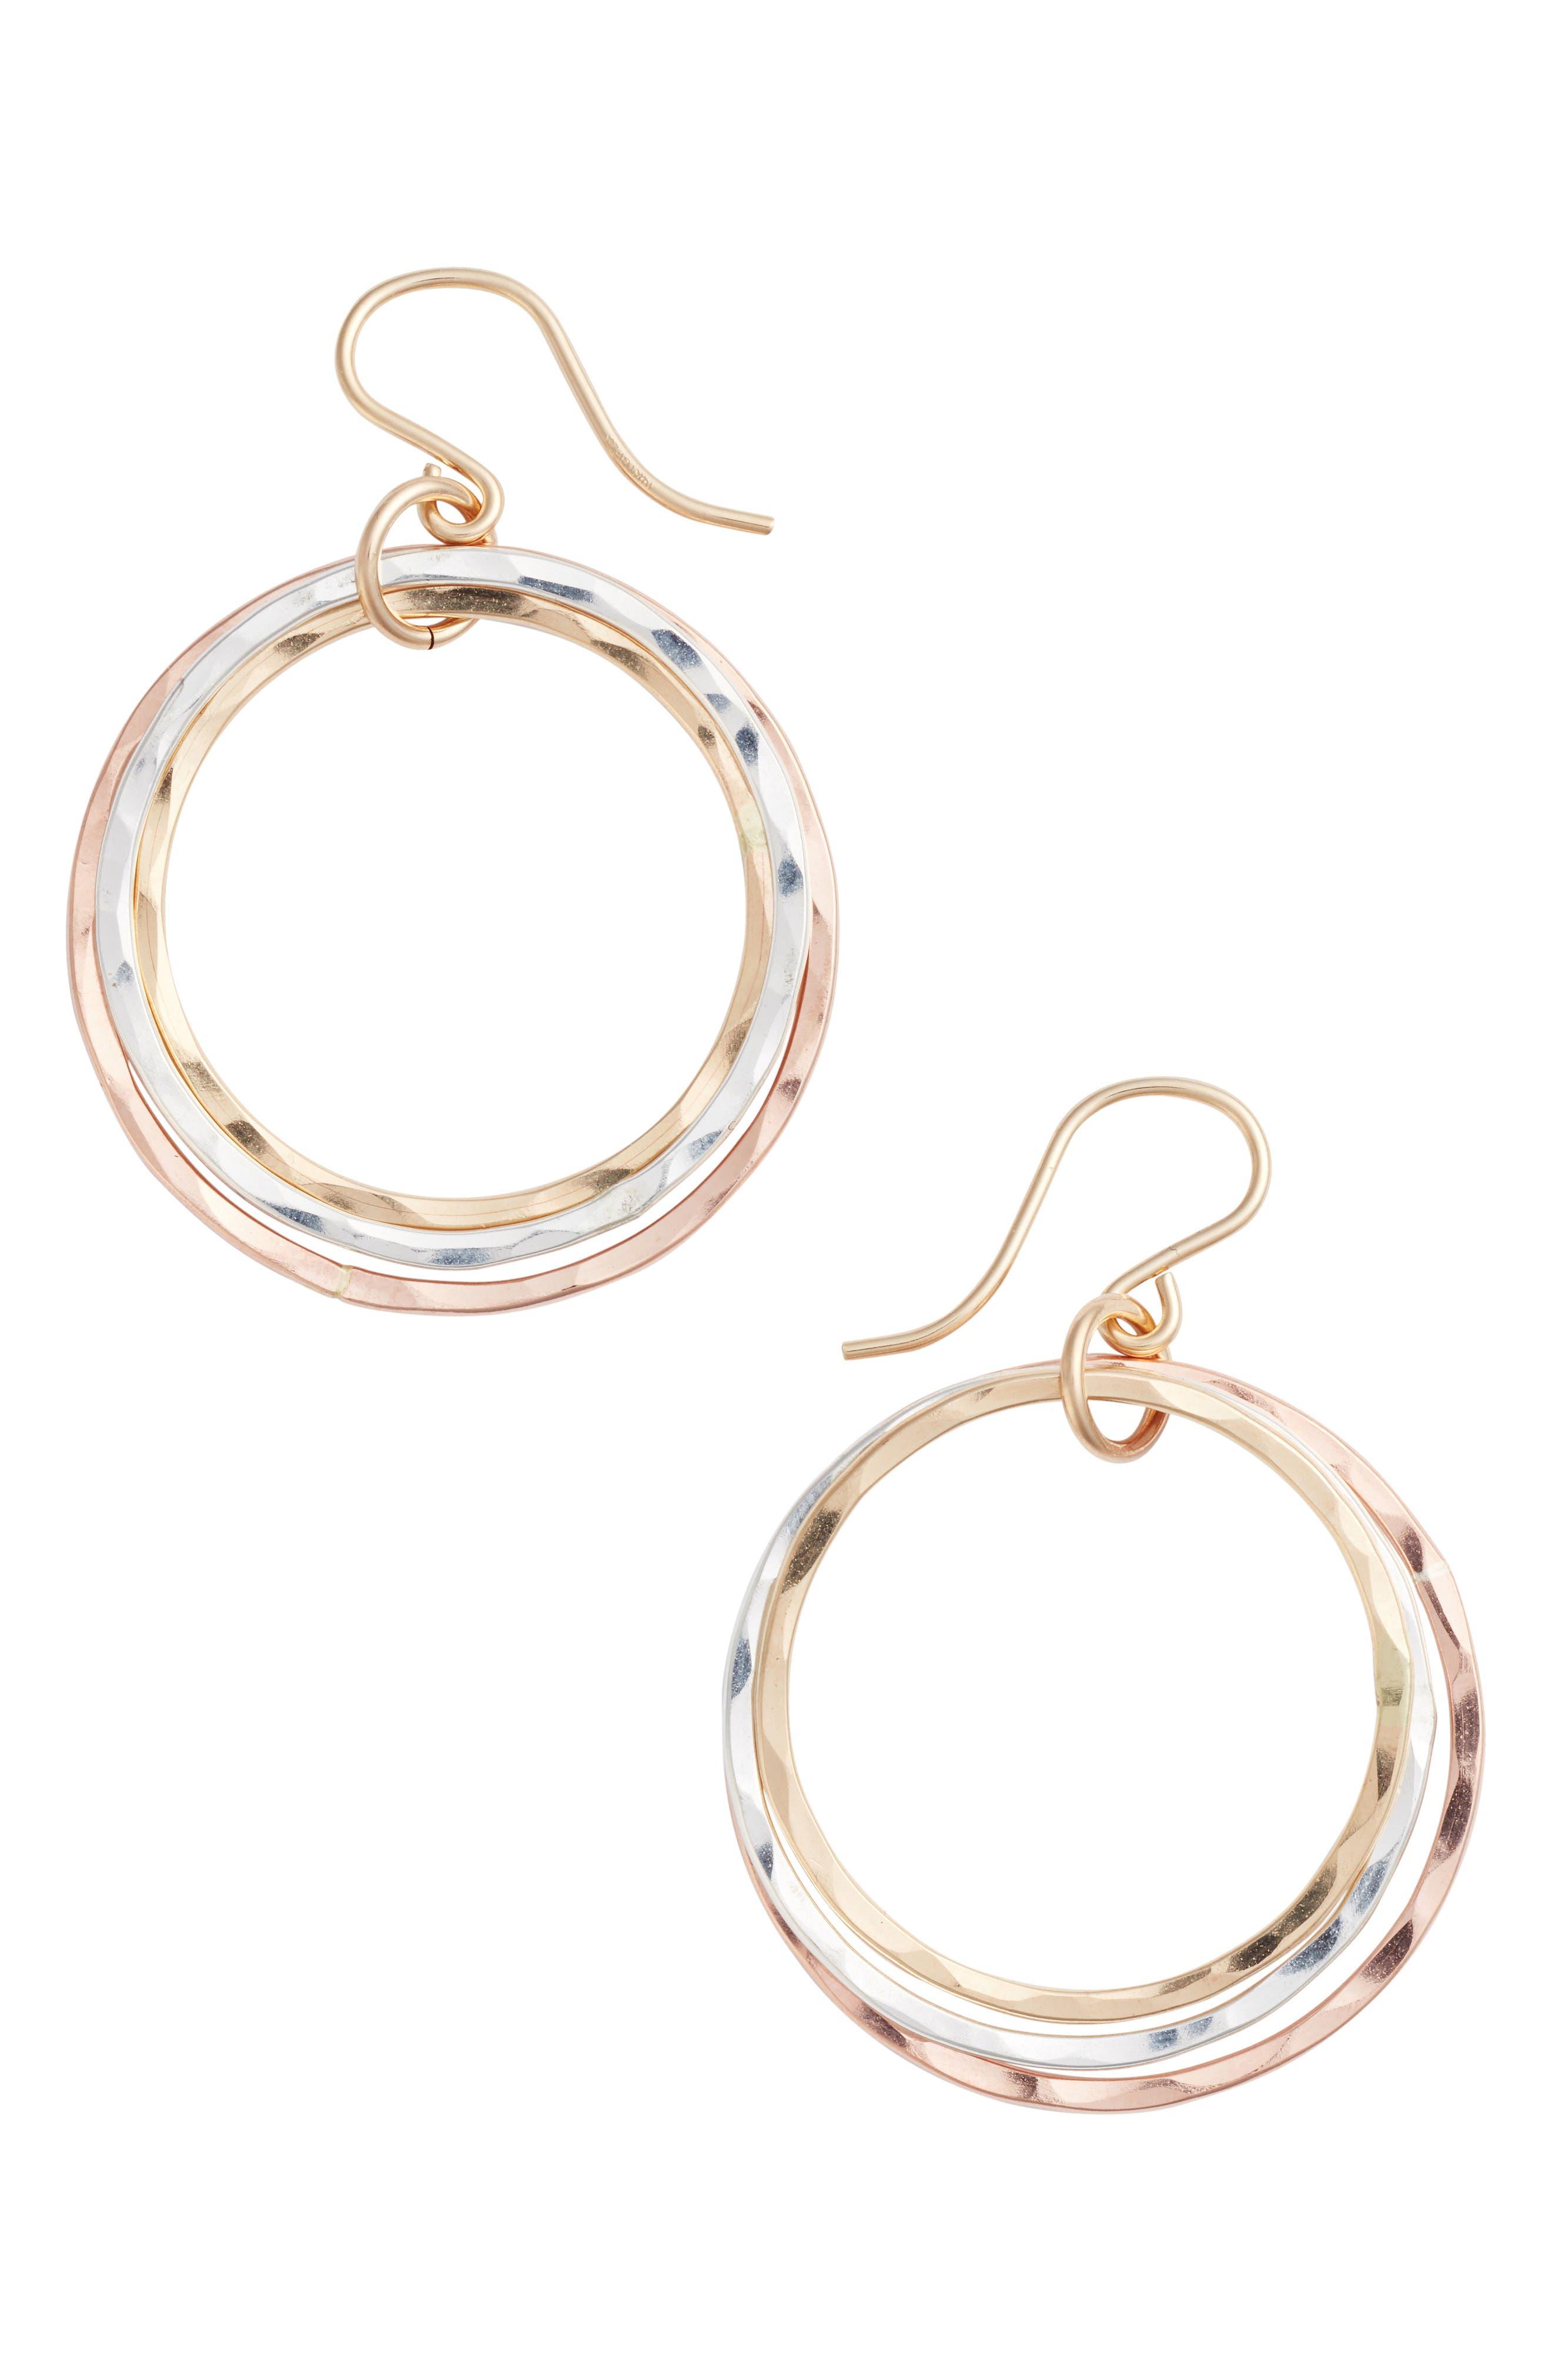 Alternate Image 1 Selected - Nashelle Wellness Small Hoop Earrings